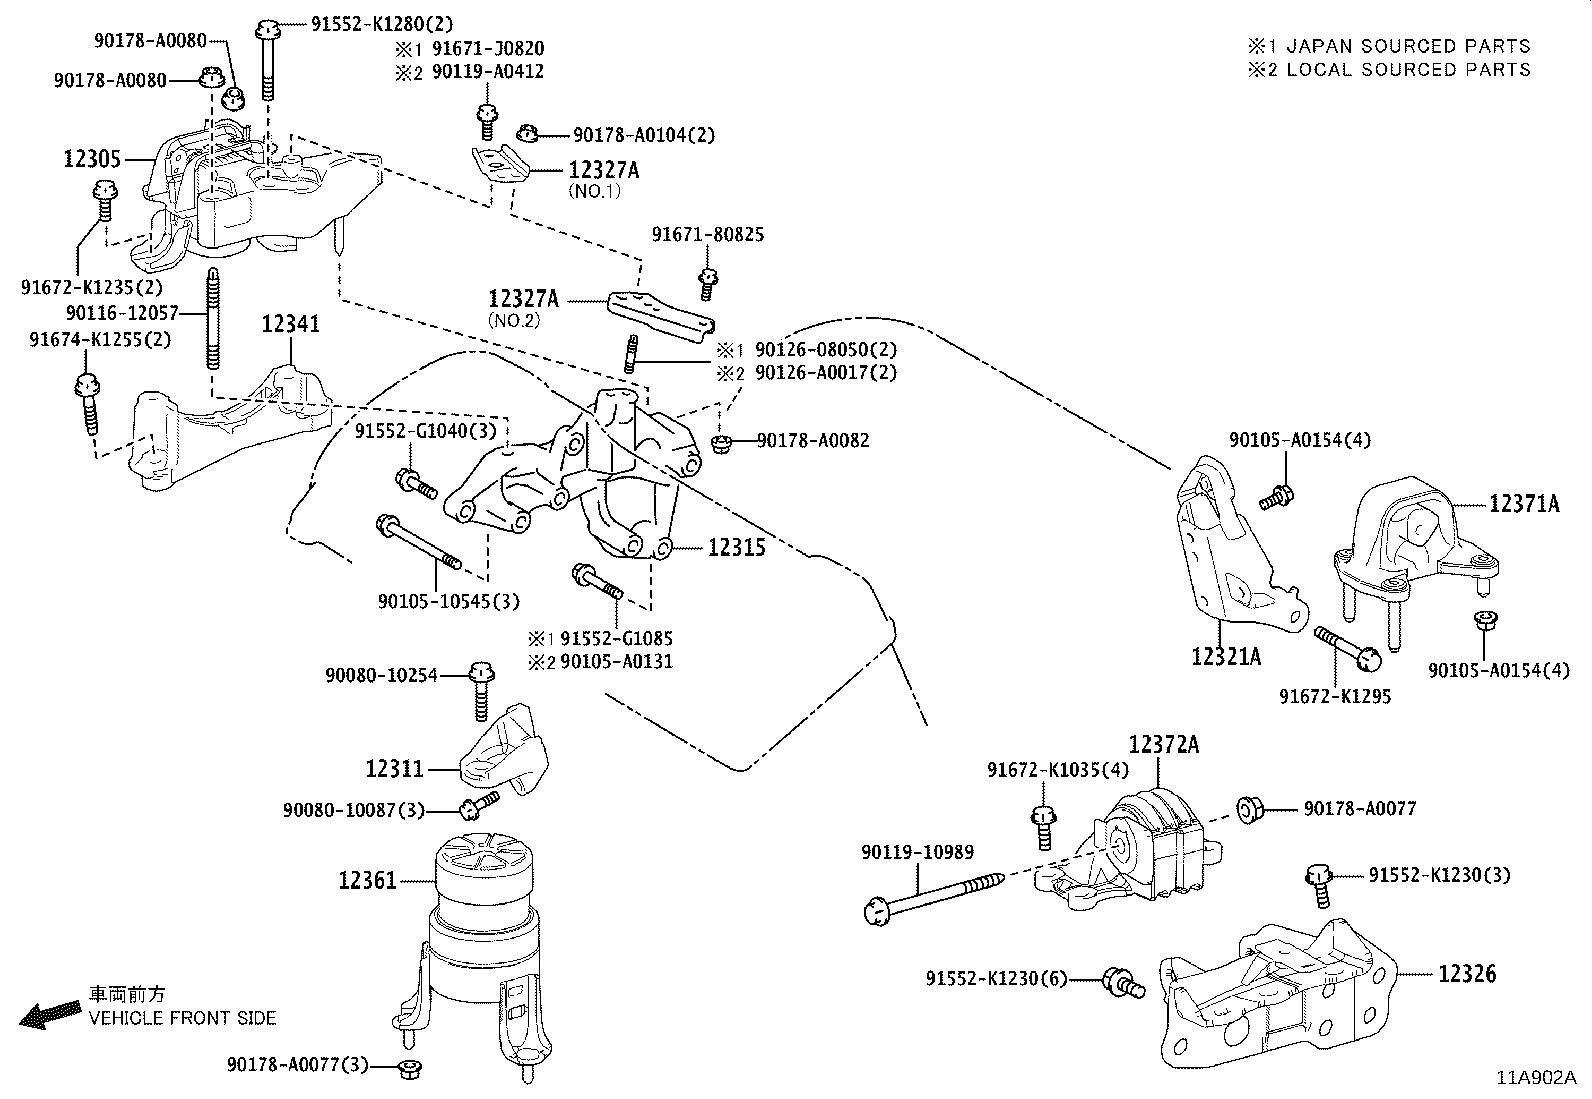 123150P080 - Bracket, engine mounting, front no. 1 left ...